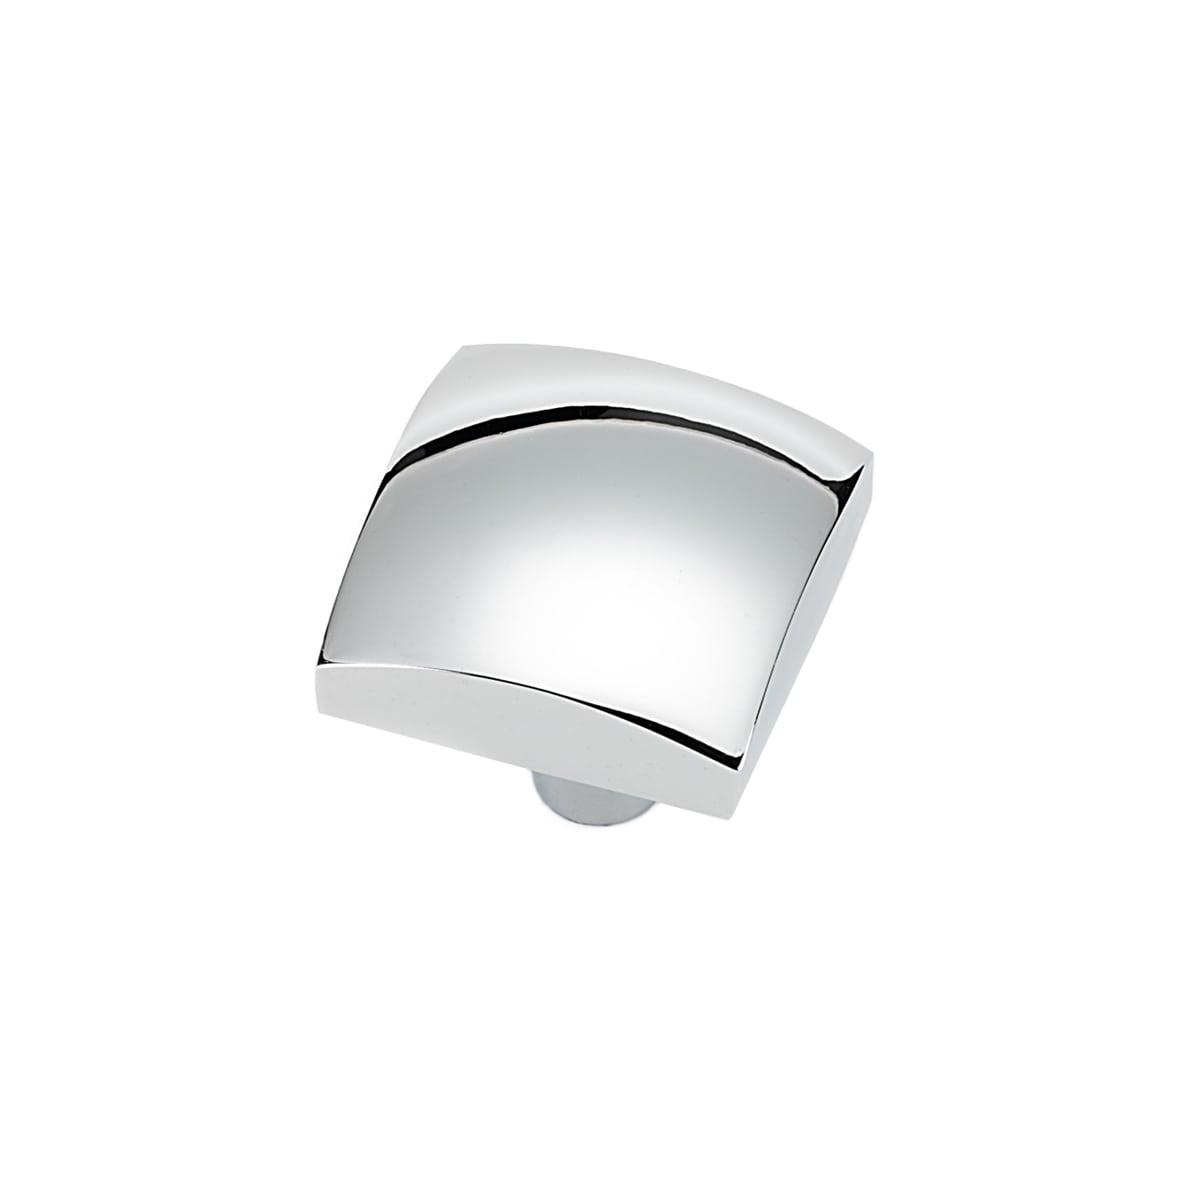 Alno Style Cents 1-1/4 Inch Square Cabinet Knob